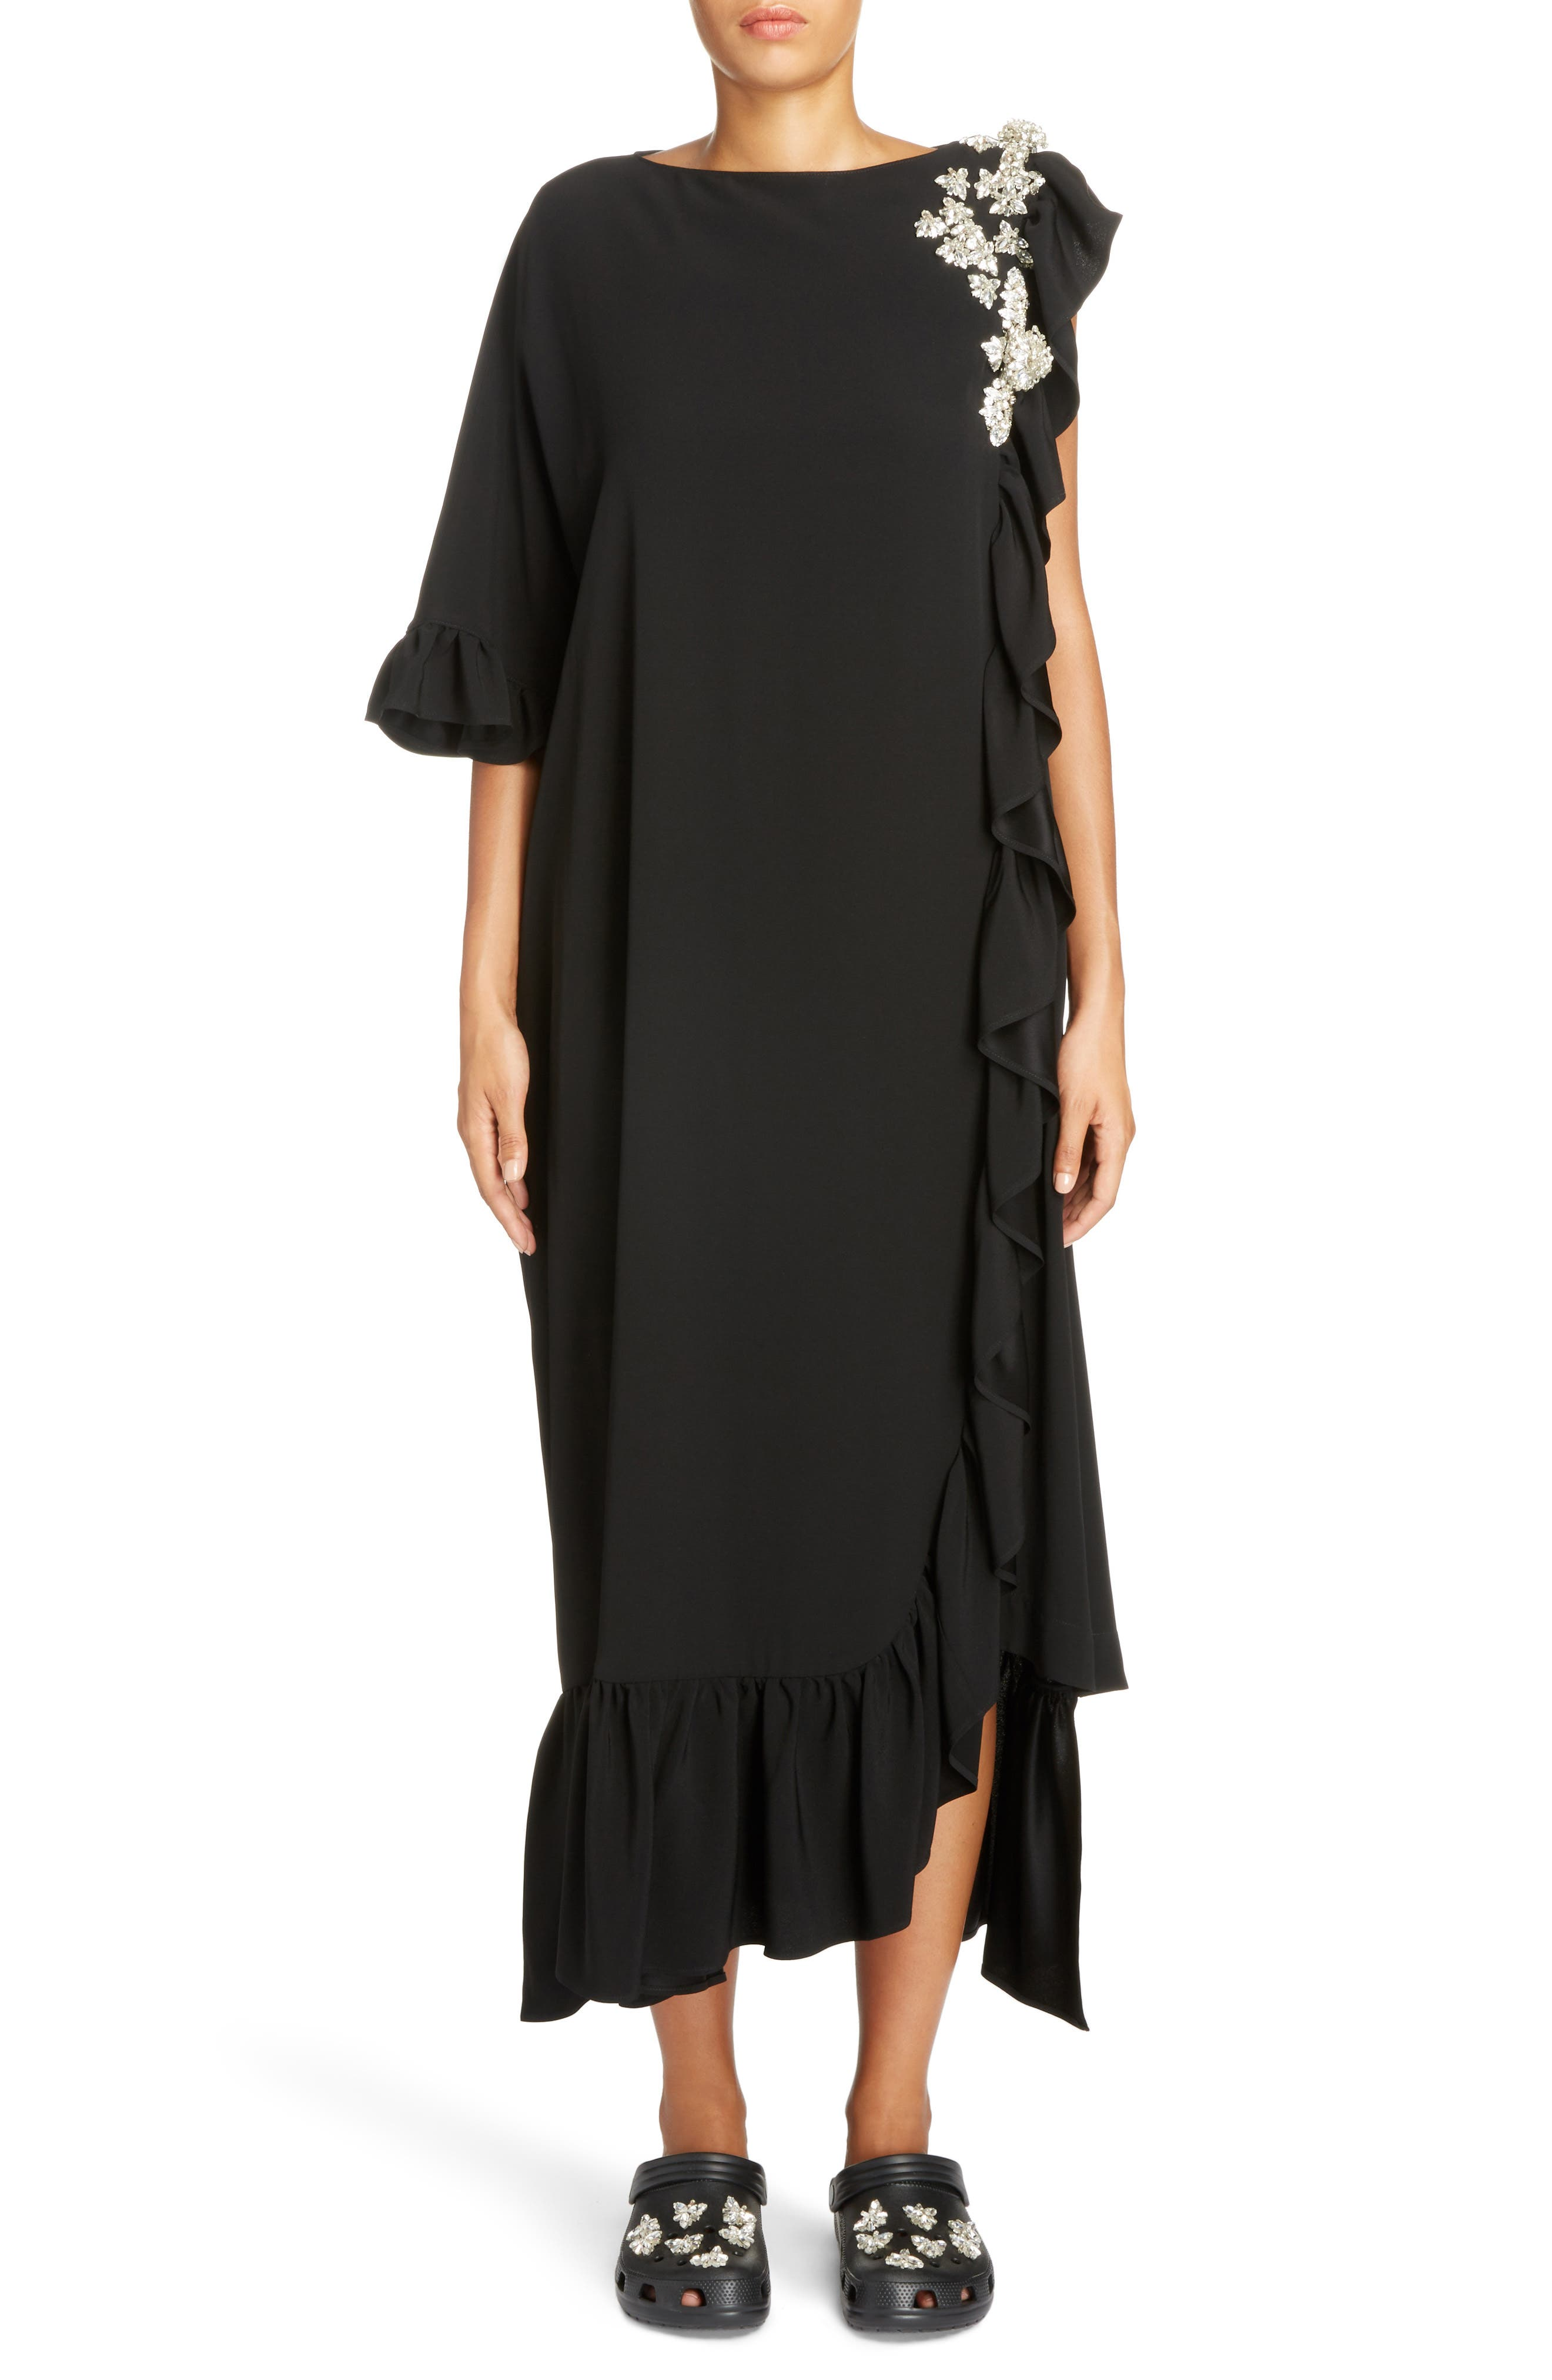 Crystal Embellished Frill Maxi Dress,                         Main,                         color, 001